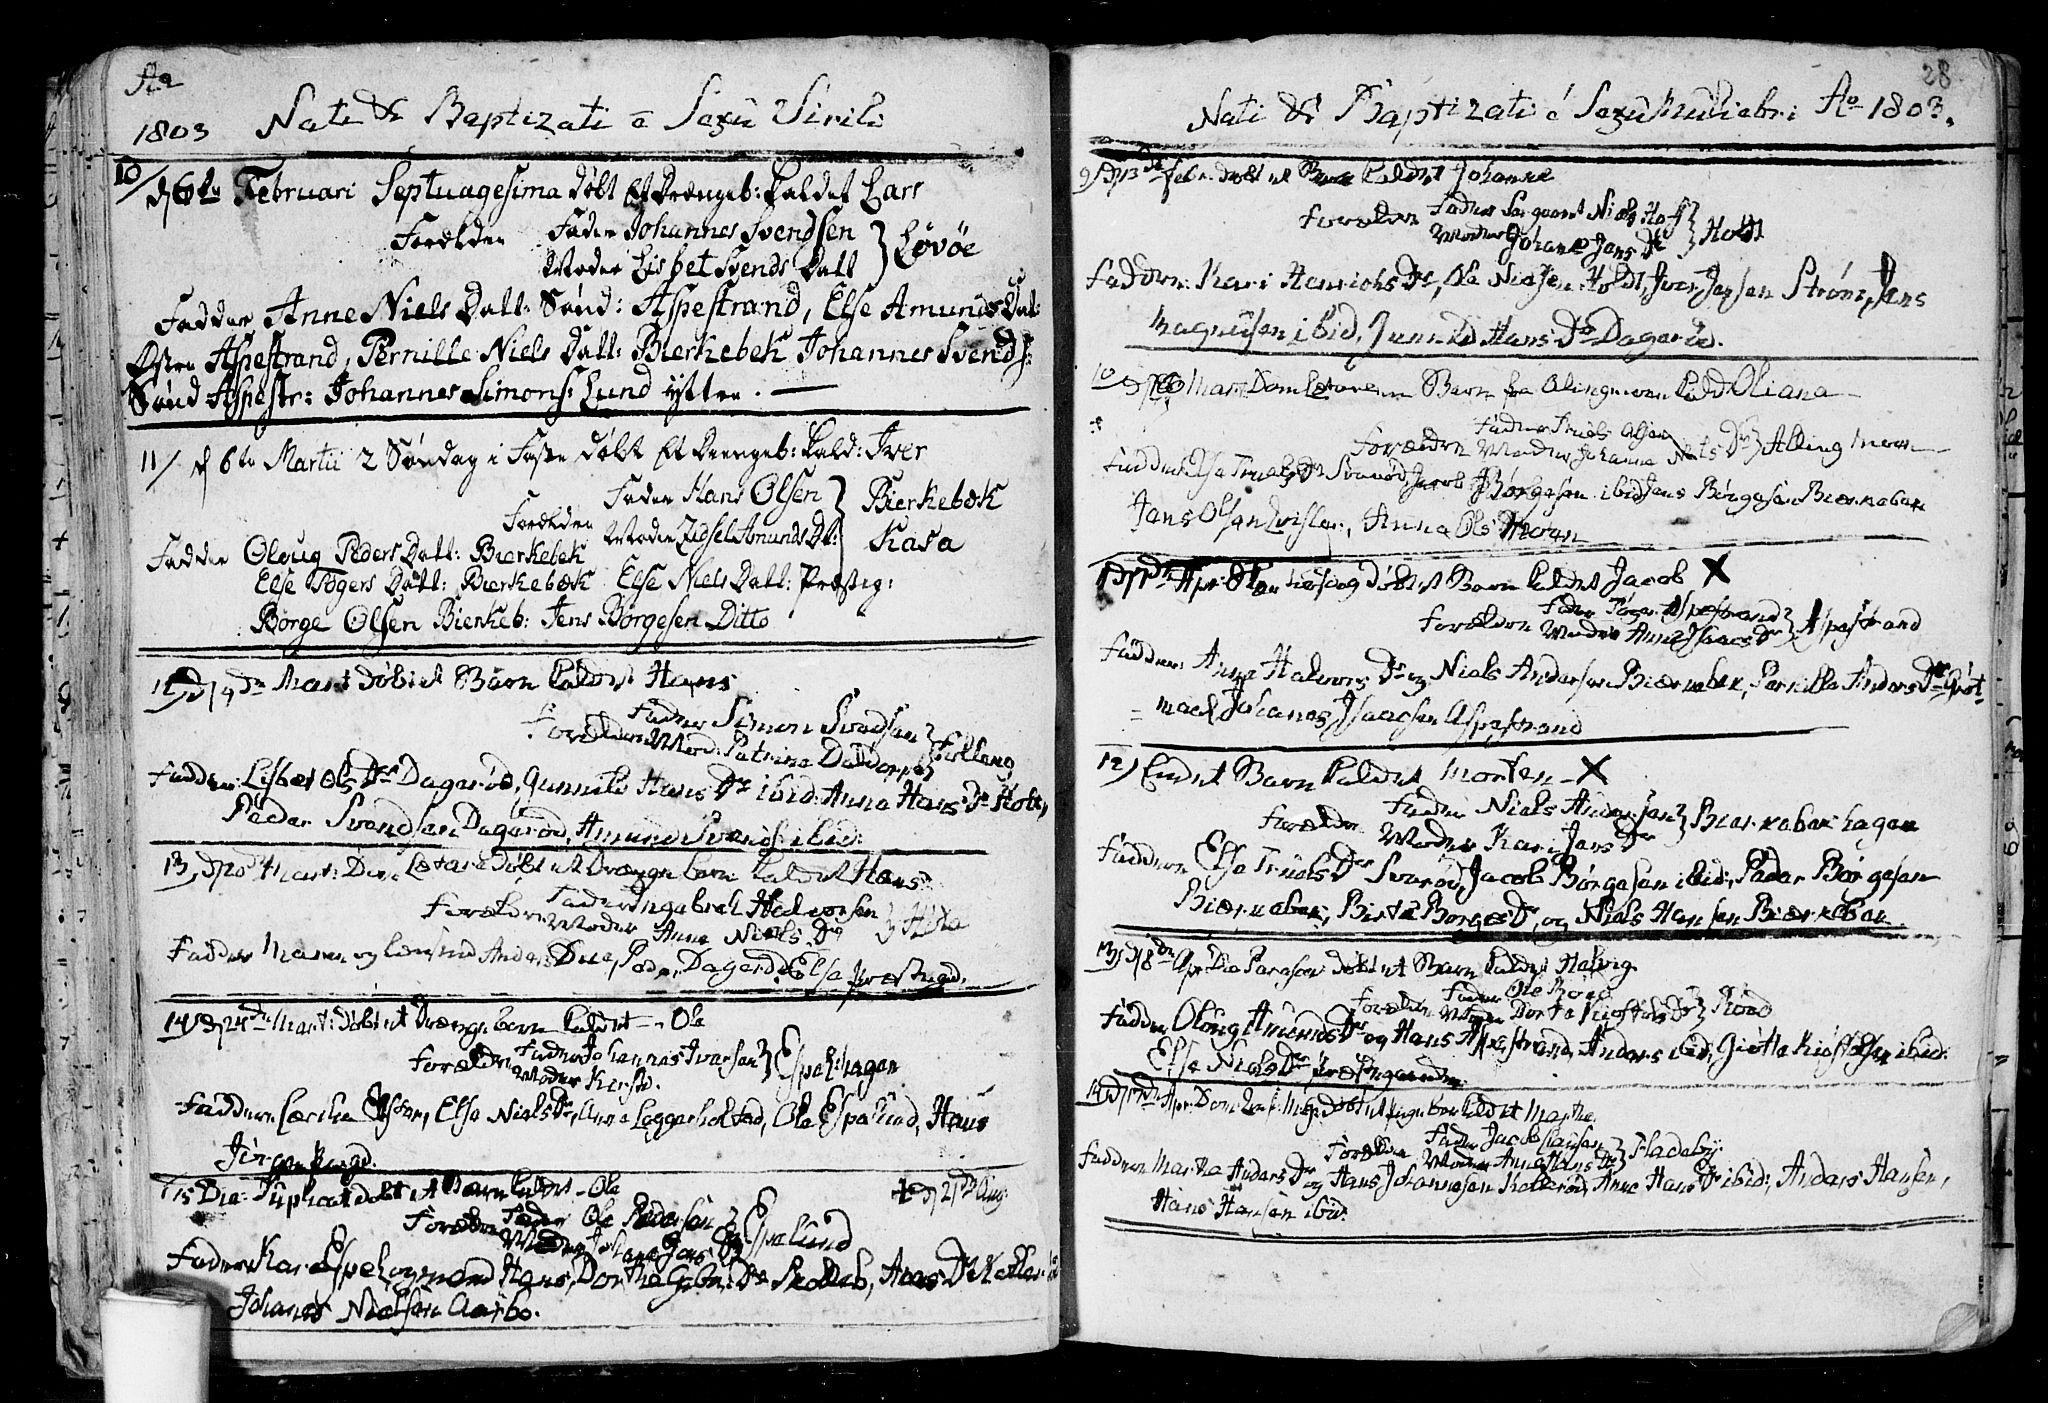 SAO, Aremark prestekontor Kirkebøker, F/Fa/L0004: Ministerialbok nr. I 4, 1796-1814, s. 28